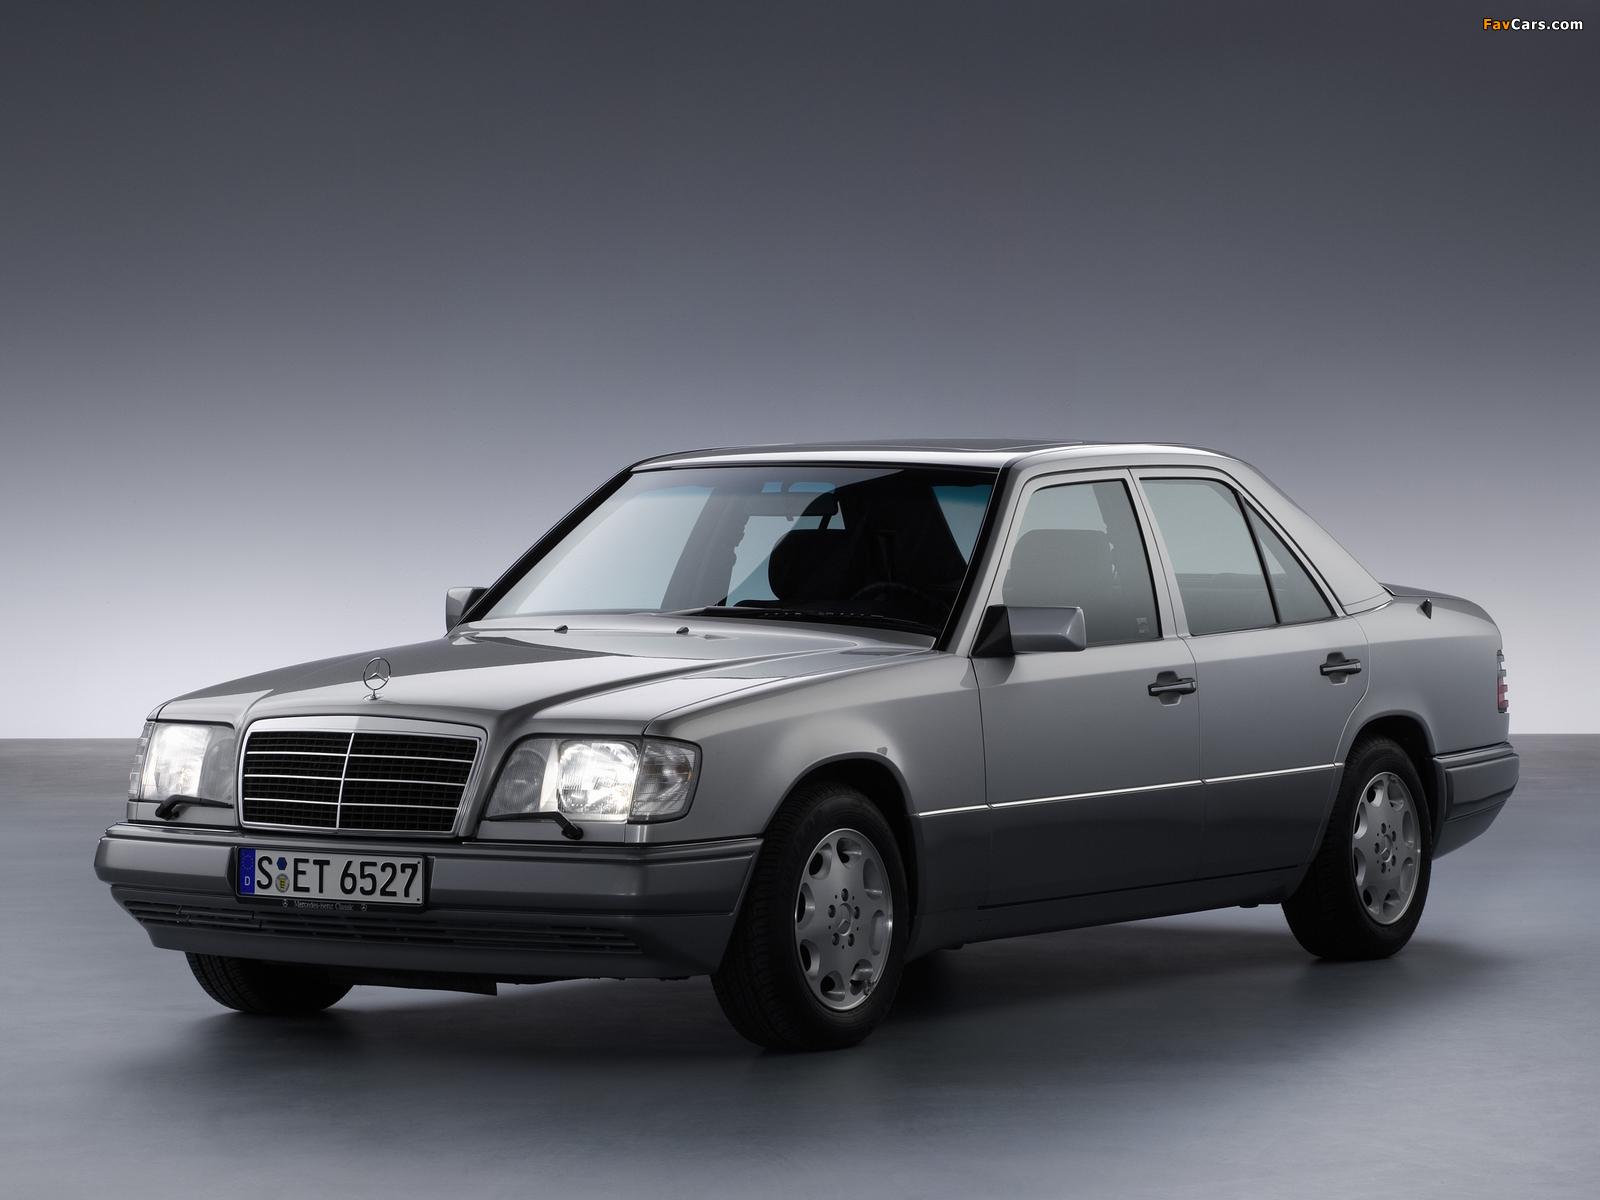 Mercedes Benz E Klasse W124 1993 95 Wallpapers 1600x1200